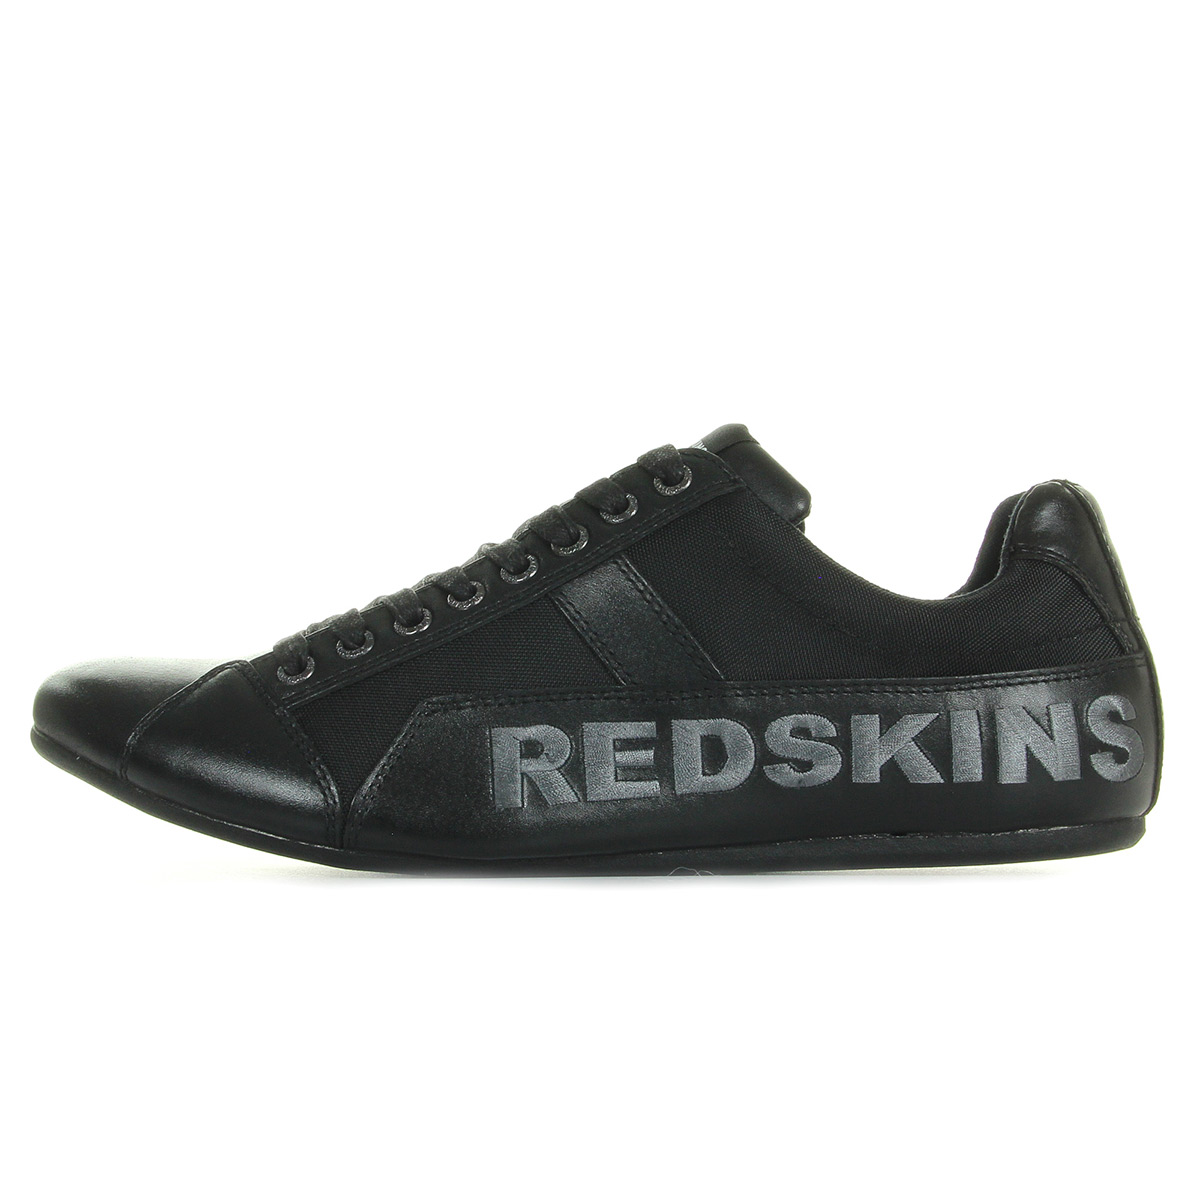 Redskins TONIKOR Noir IO58102060, Baskets mode homme